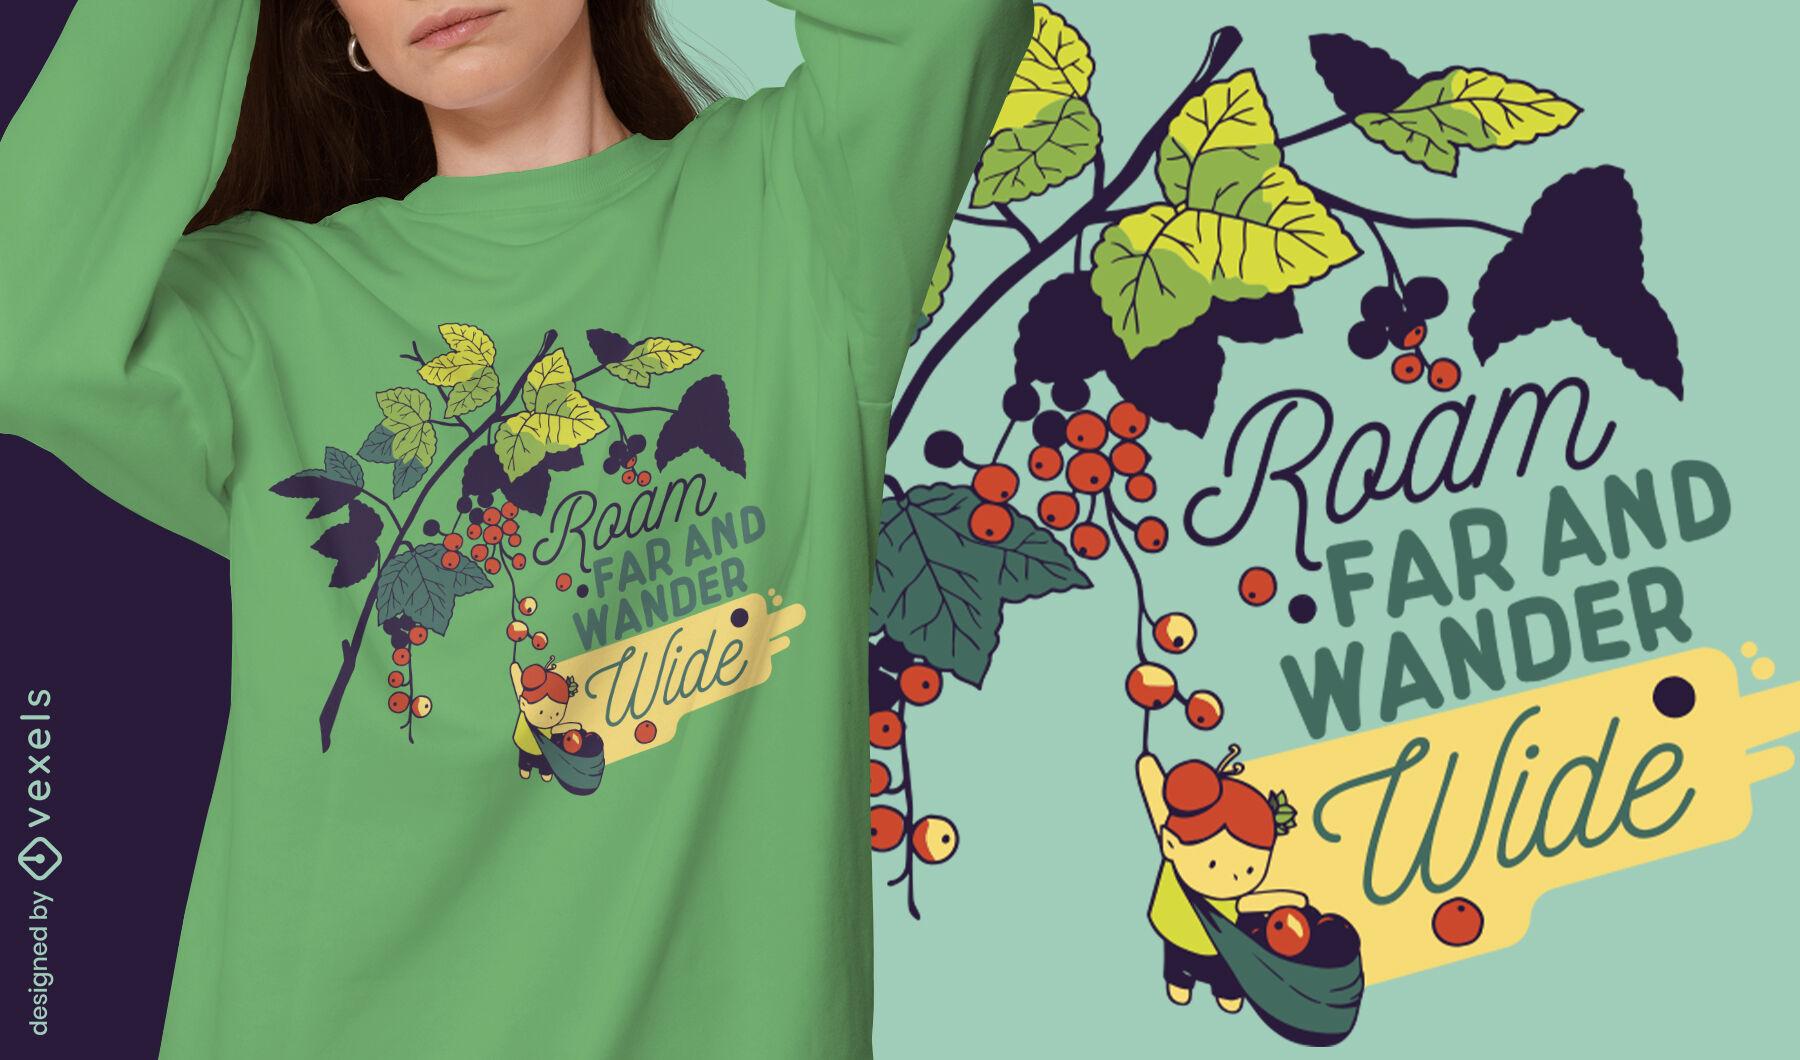 Pequeña niña recogiendo bayas en diseño de camiseta de árbol